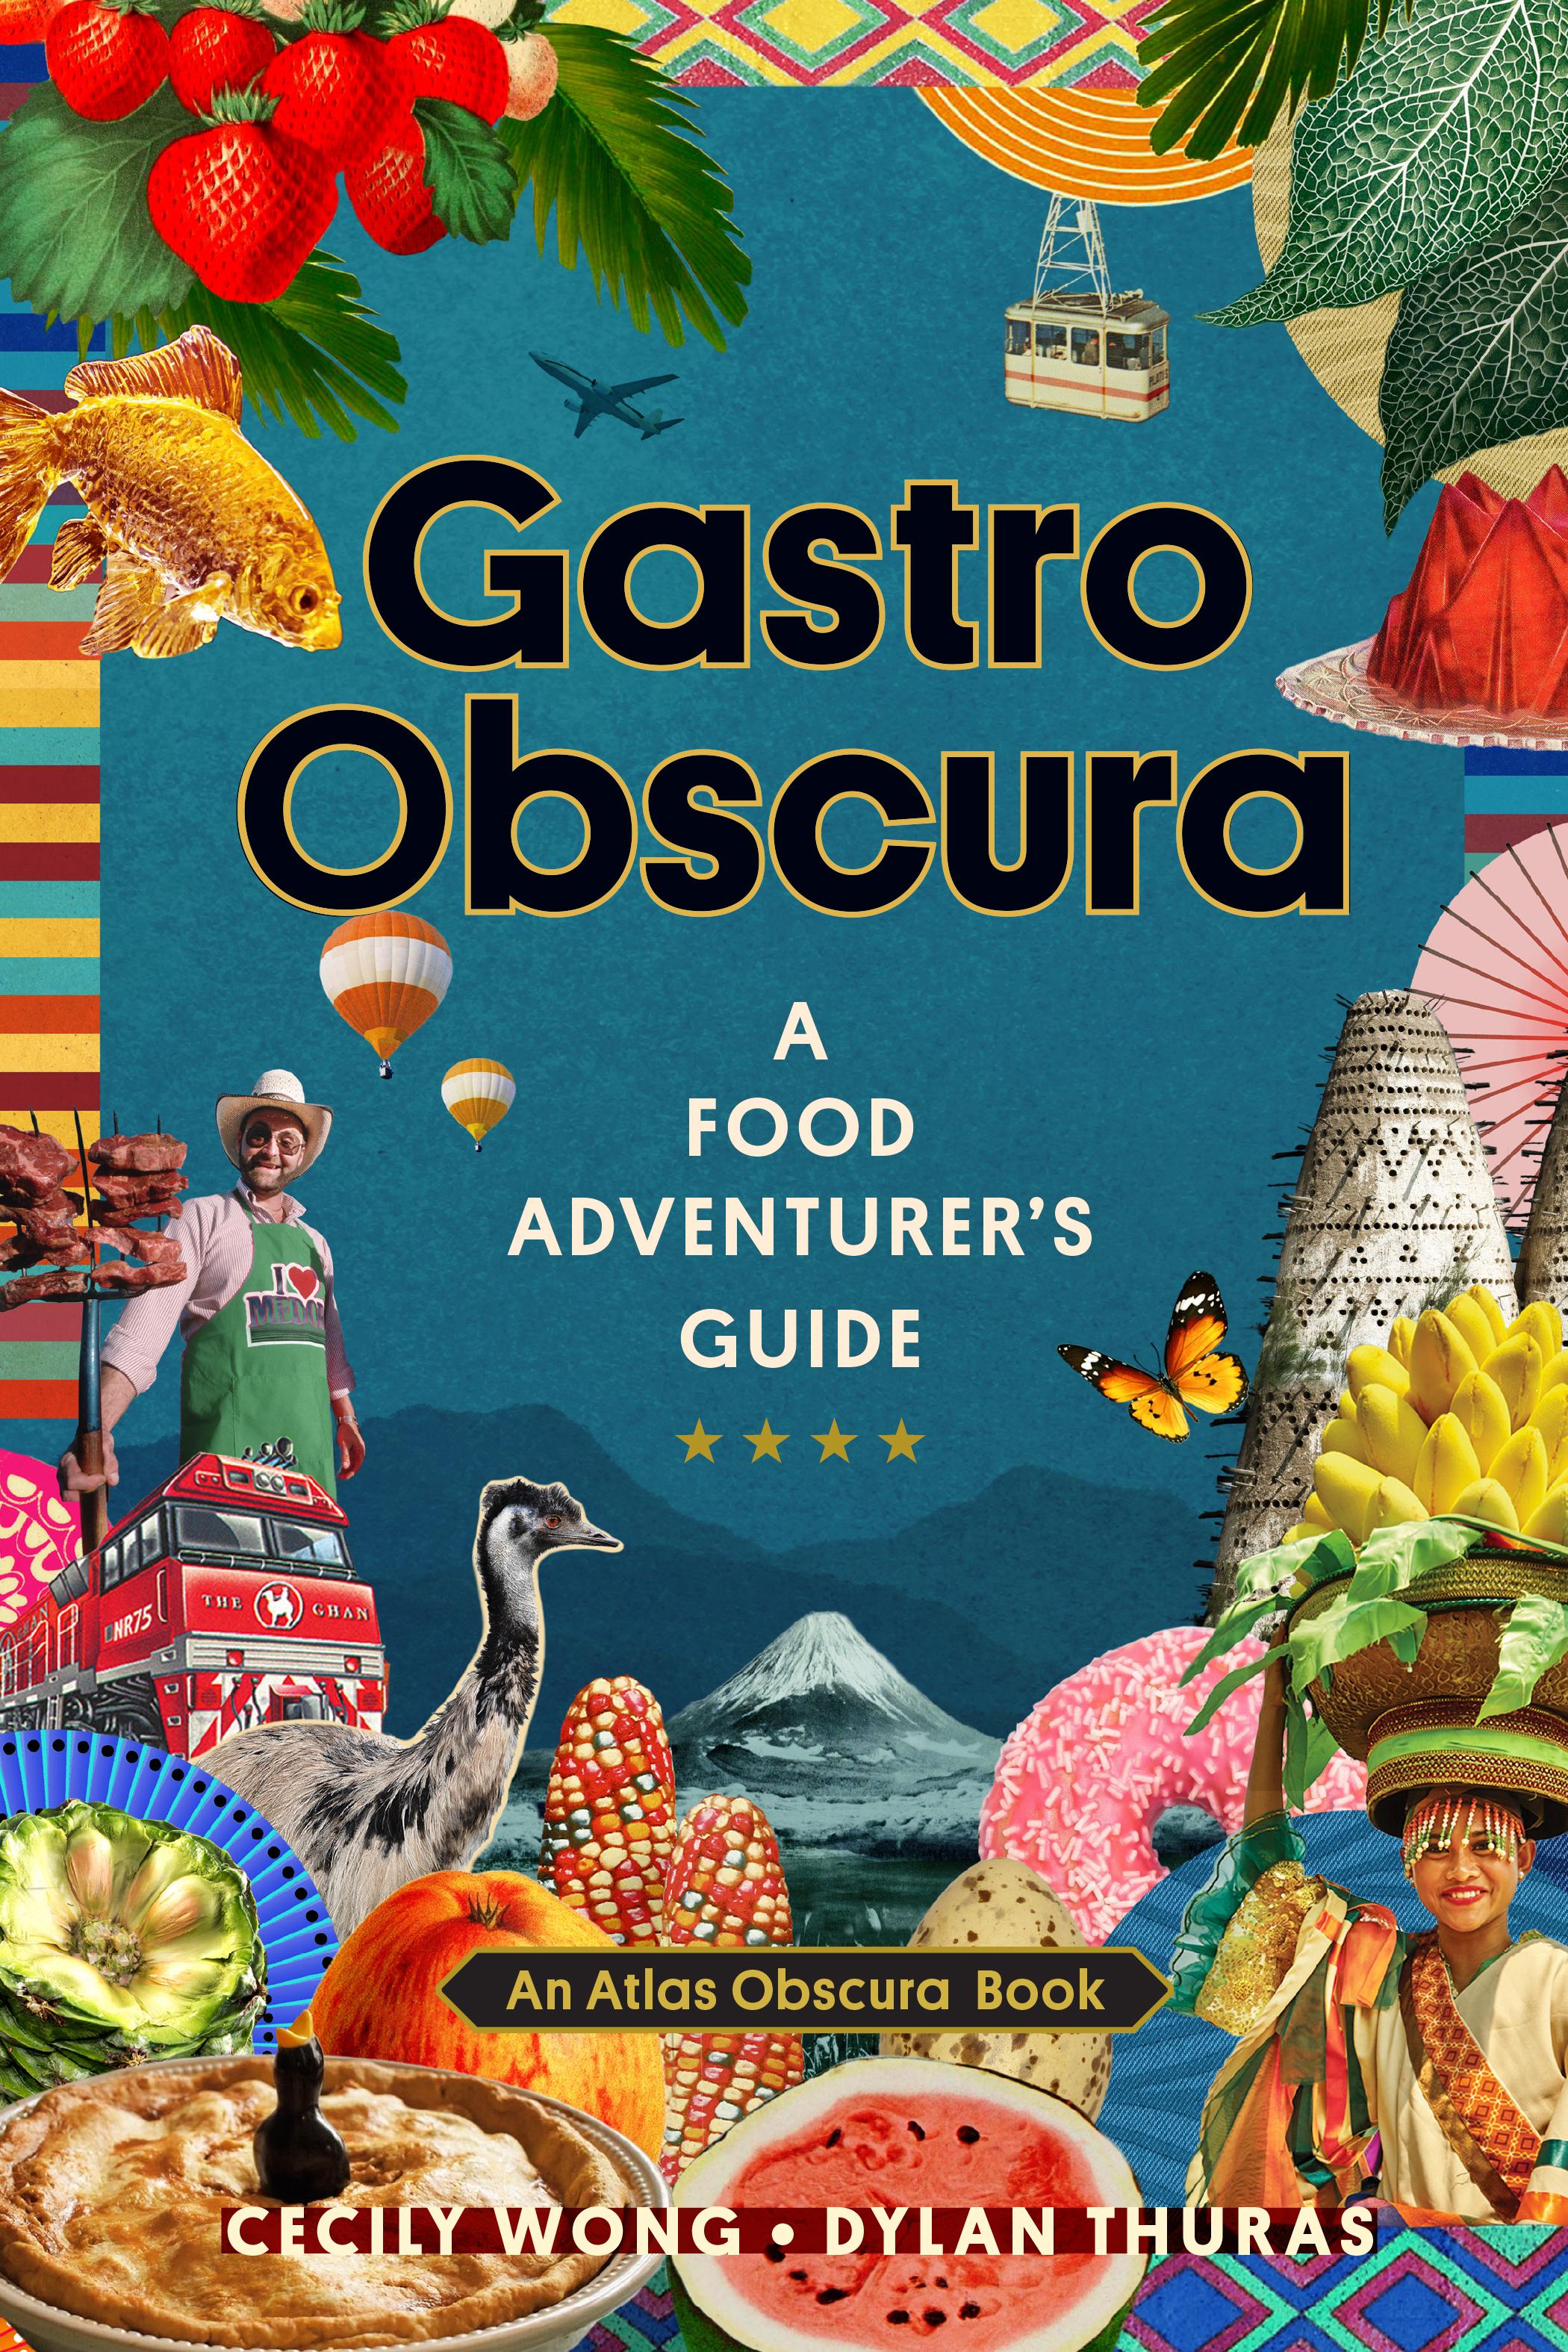 Gastro Obscura A Food Adventurer's Guide